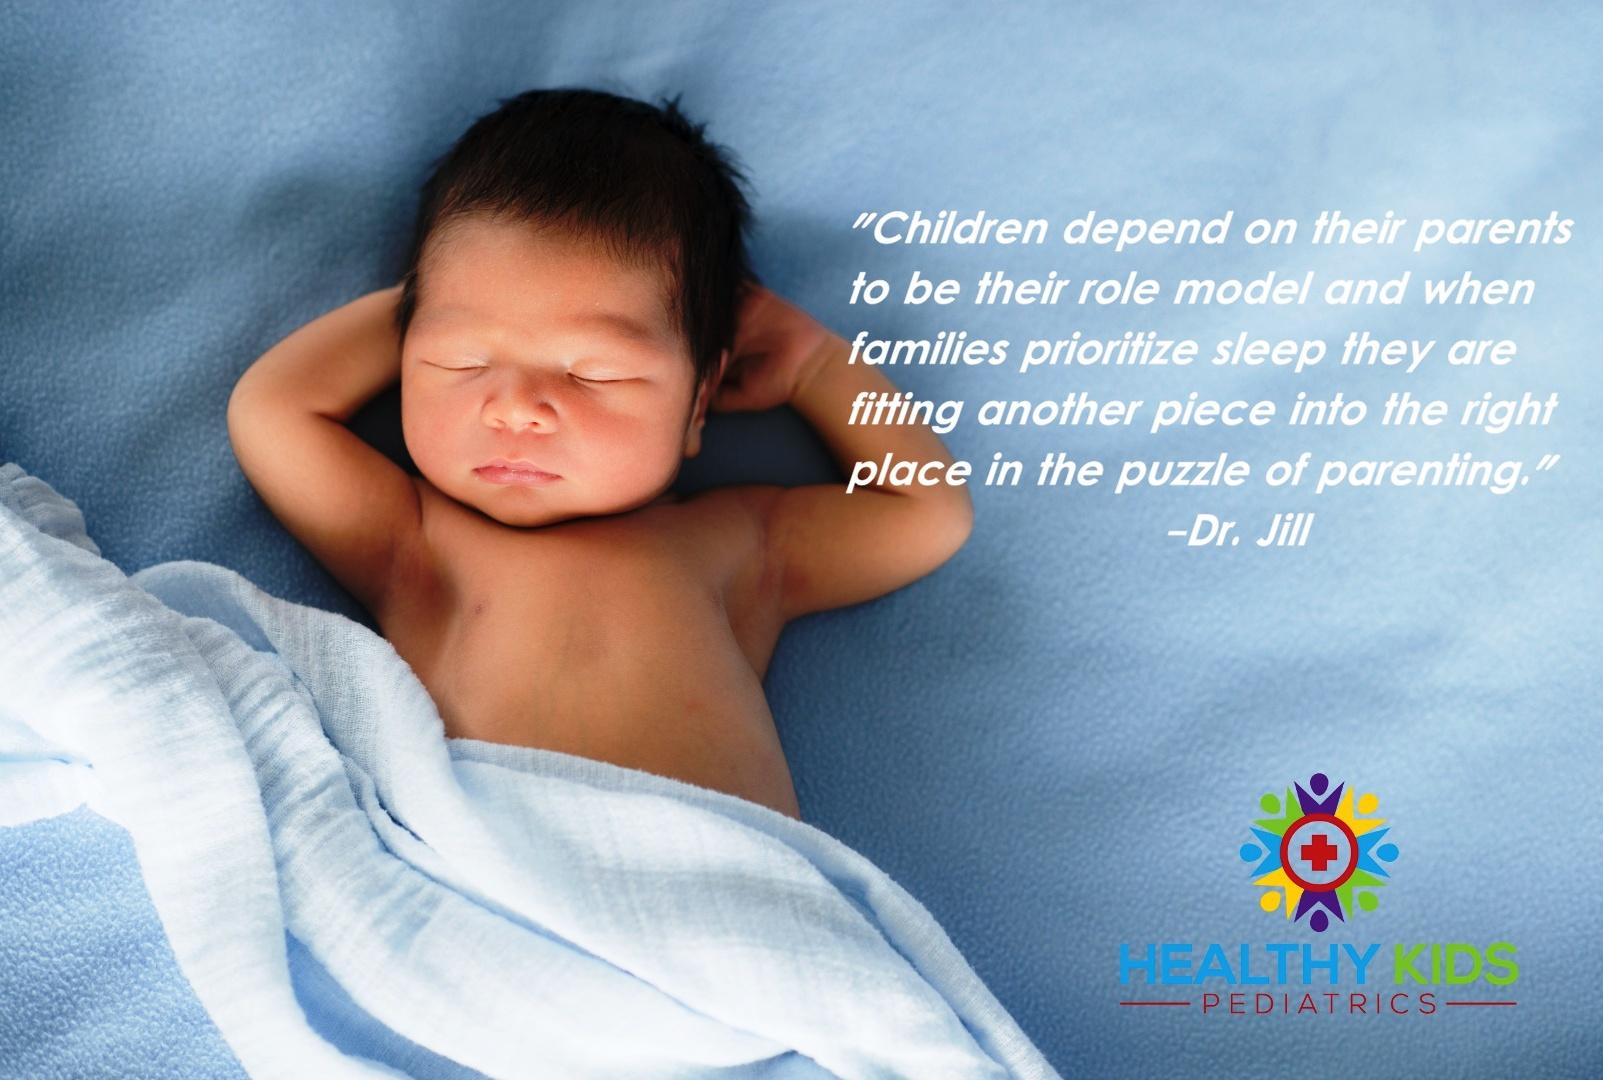 Take back the night- Dr. Jill Garripoli Pedalino - Healthy Kids Pediatrics - Nutley NJ Pediatrician.jpg